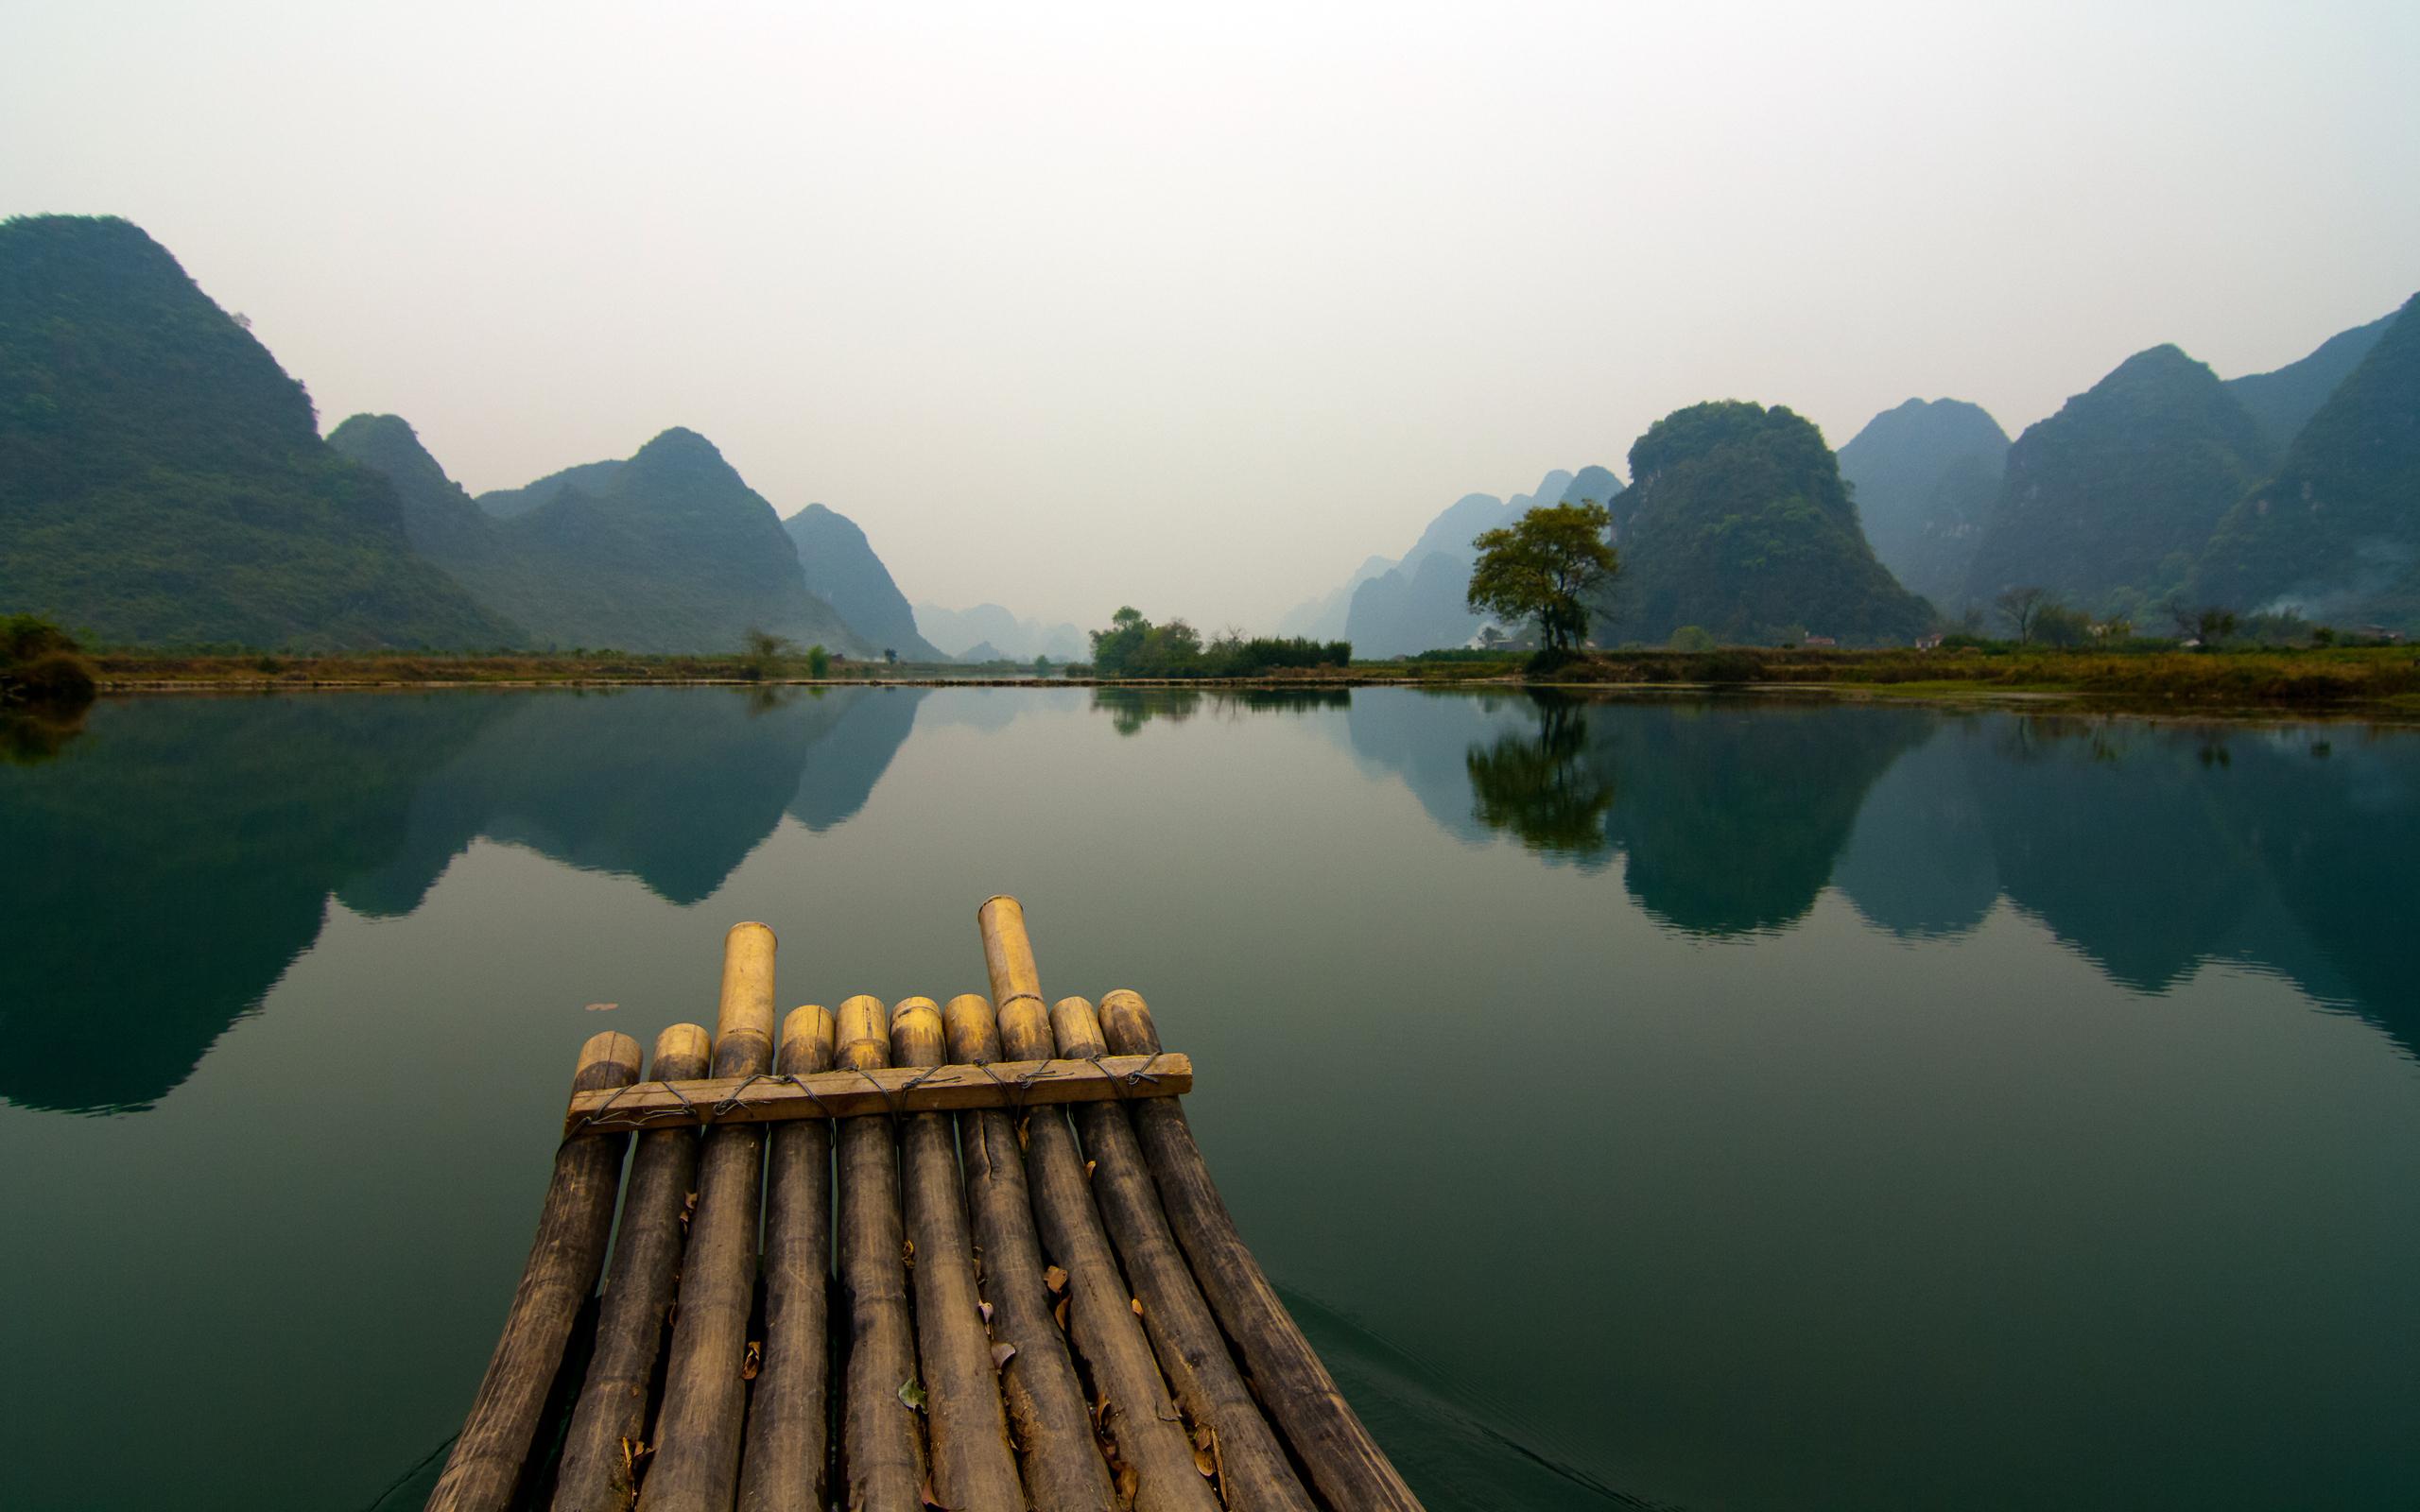 архитектура Китай озеро небо бесплатно